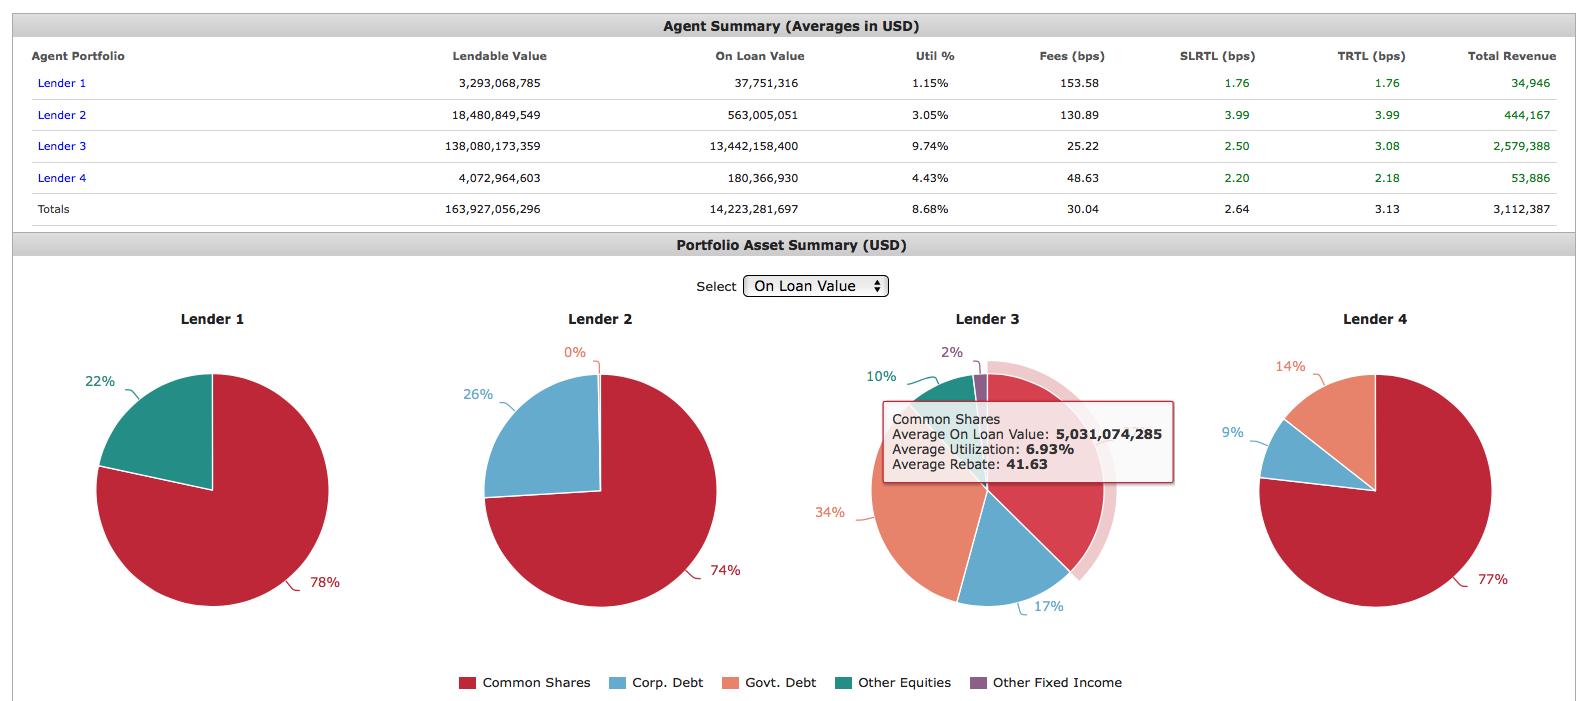 Agent Lender Summary Statistics